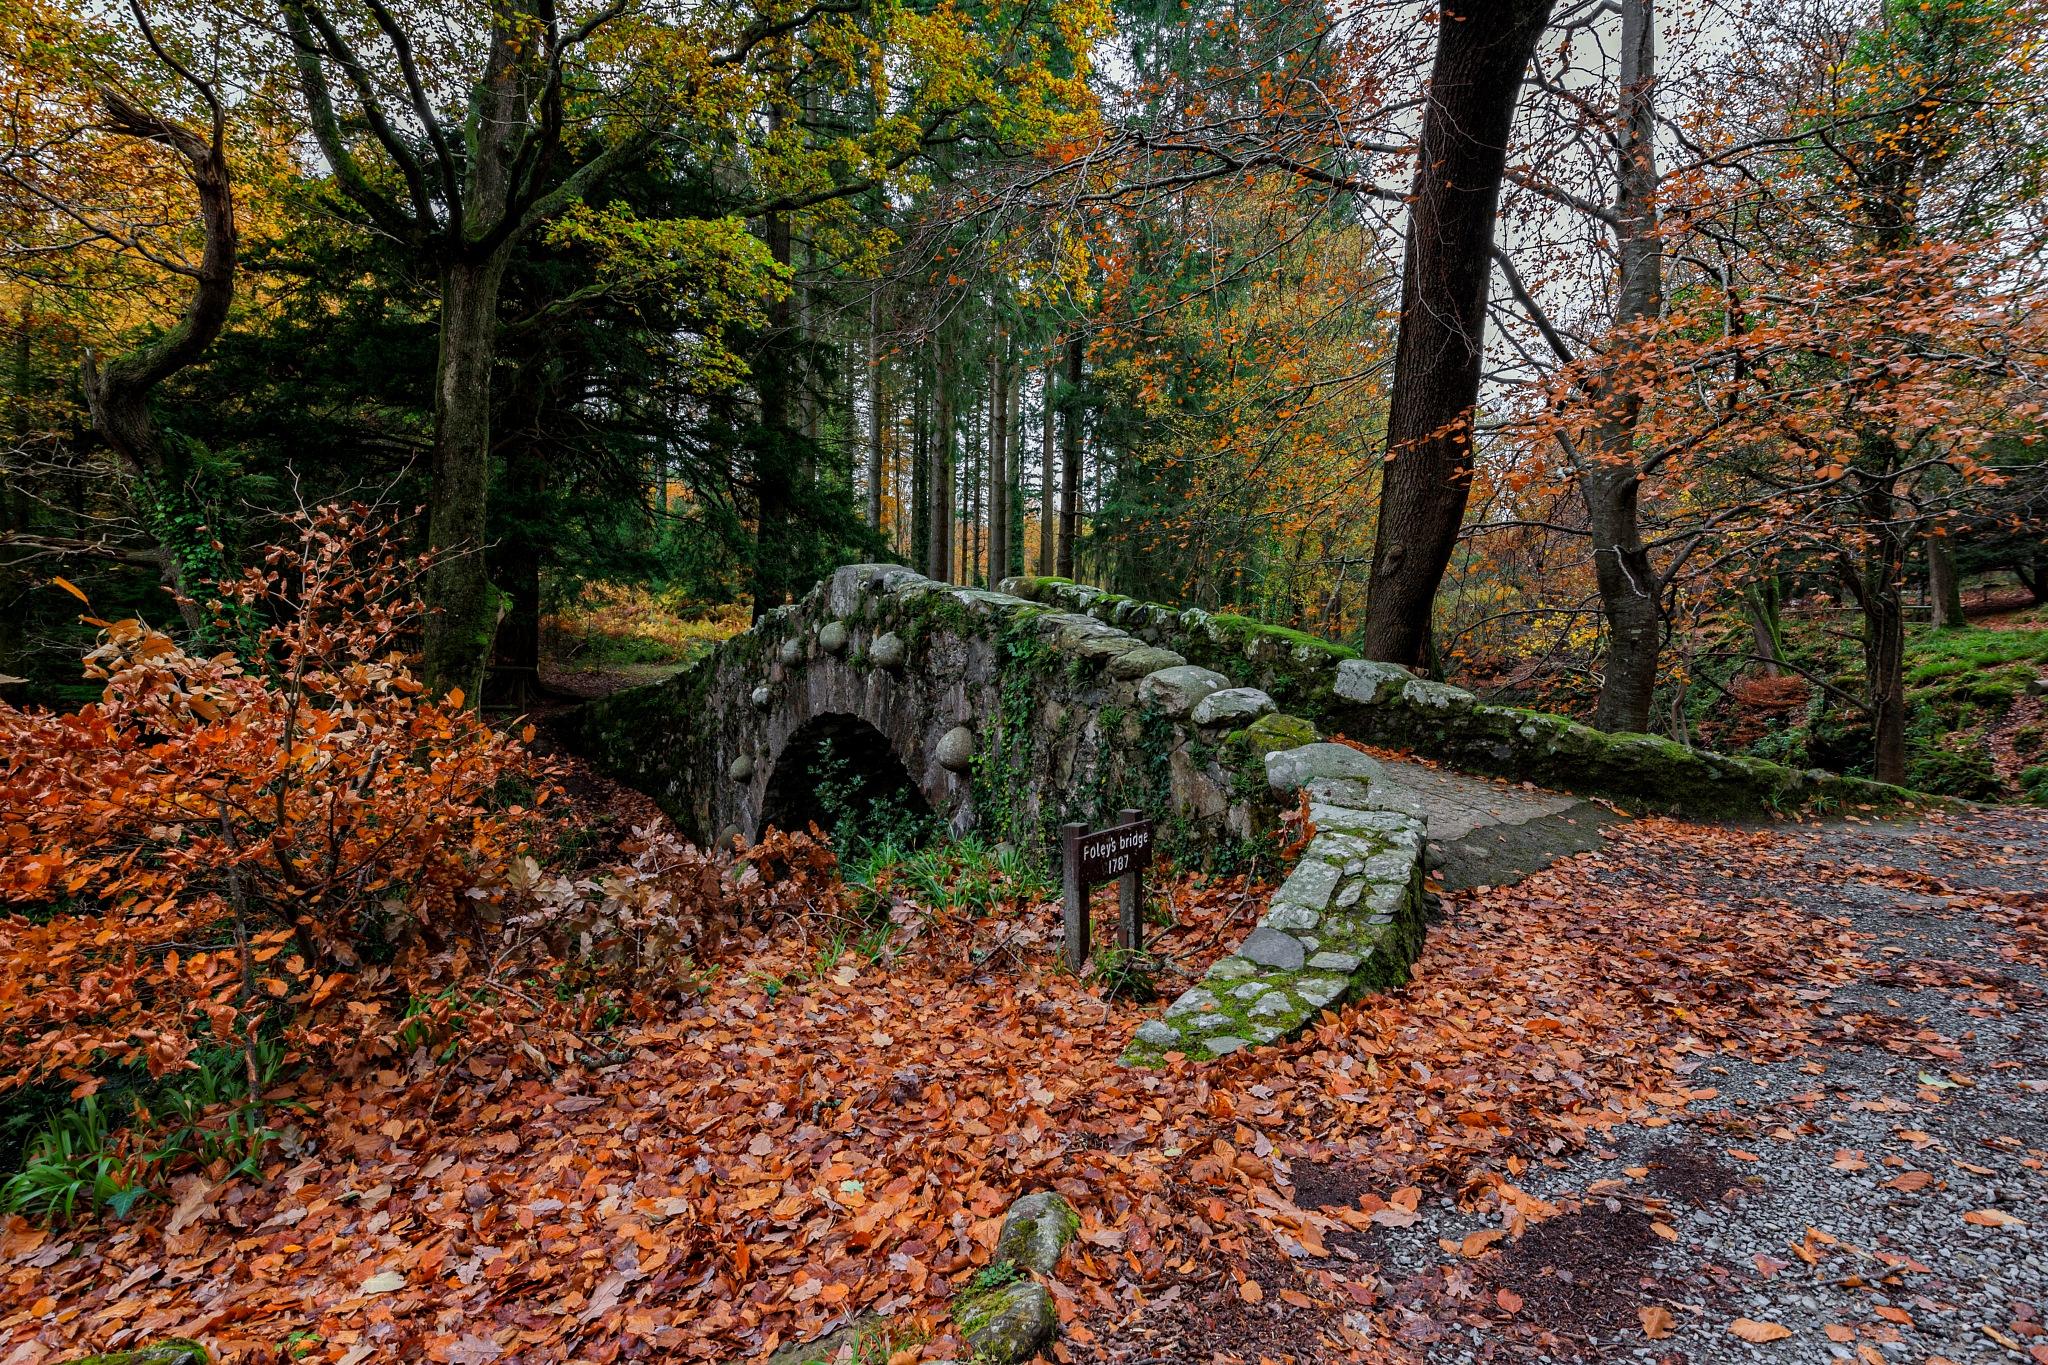 Foley's Bridge by Barrie Lathwell